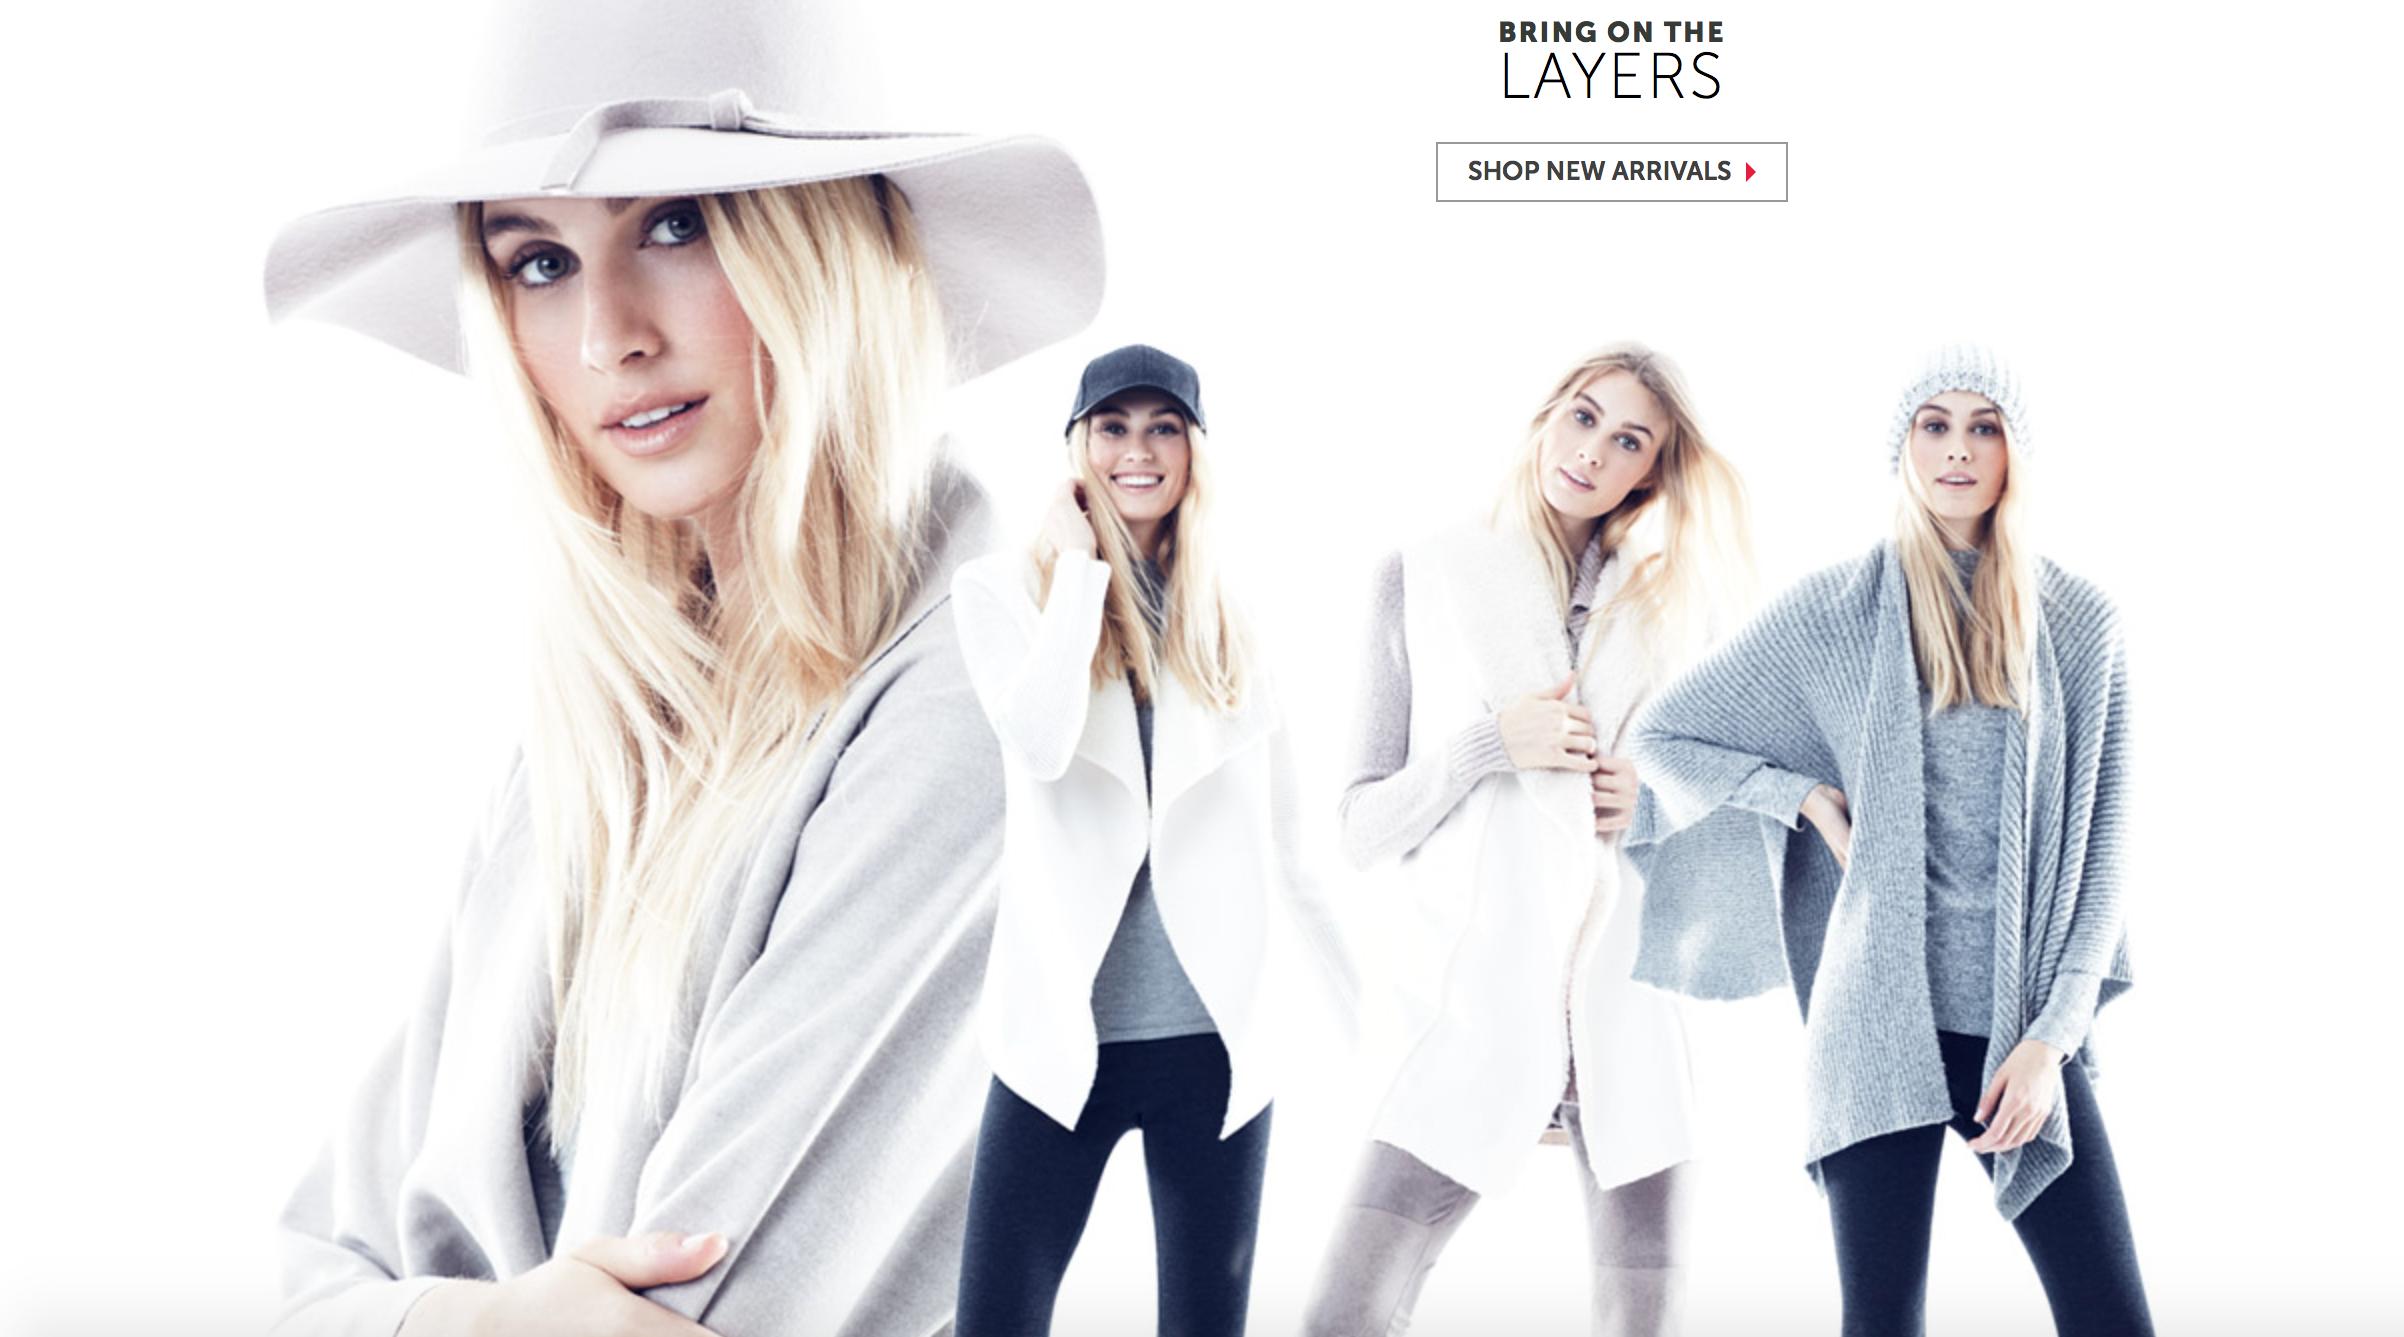 #FashionFriday: Cozy Fall Fashion Is Here!